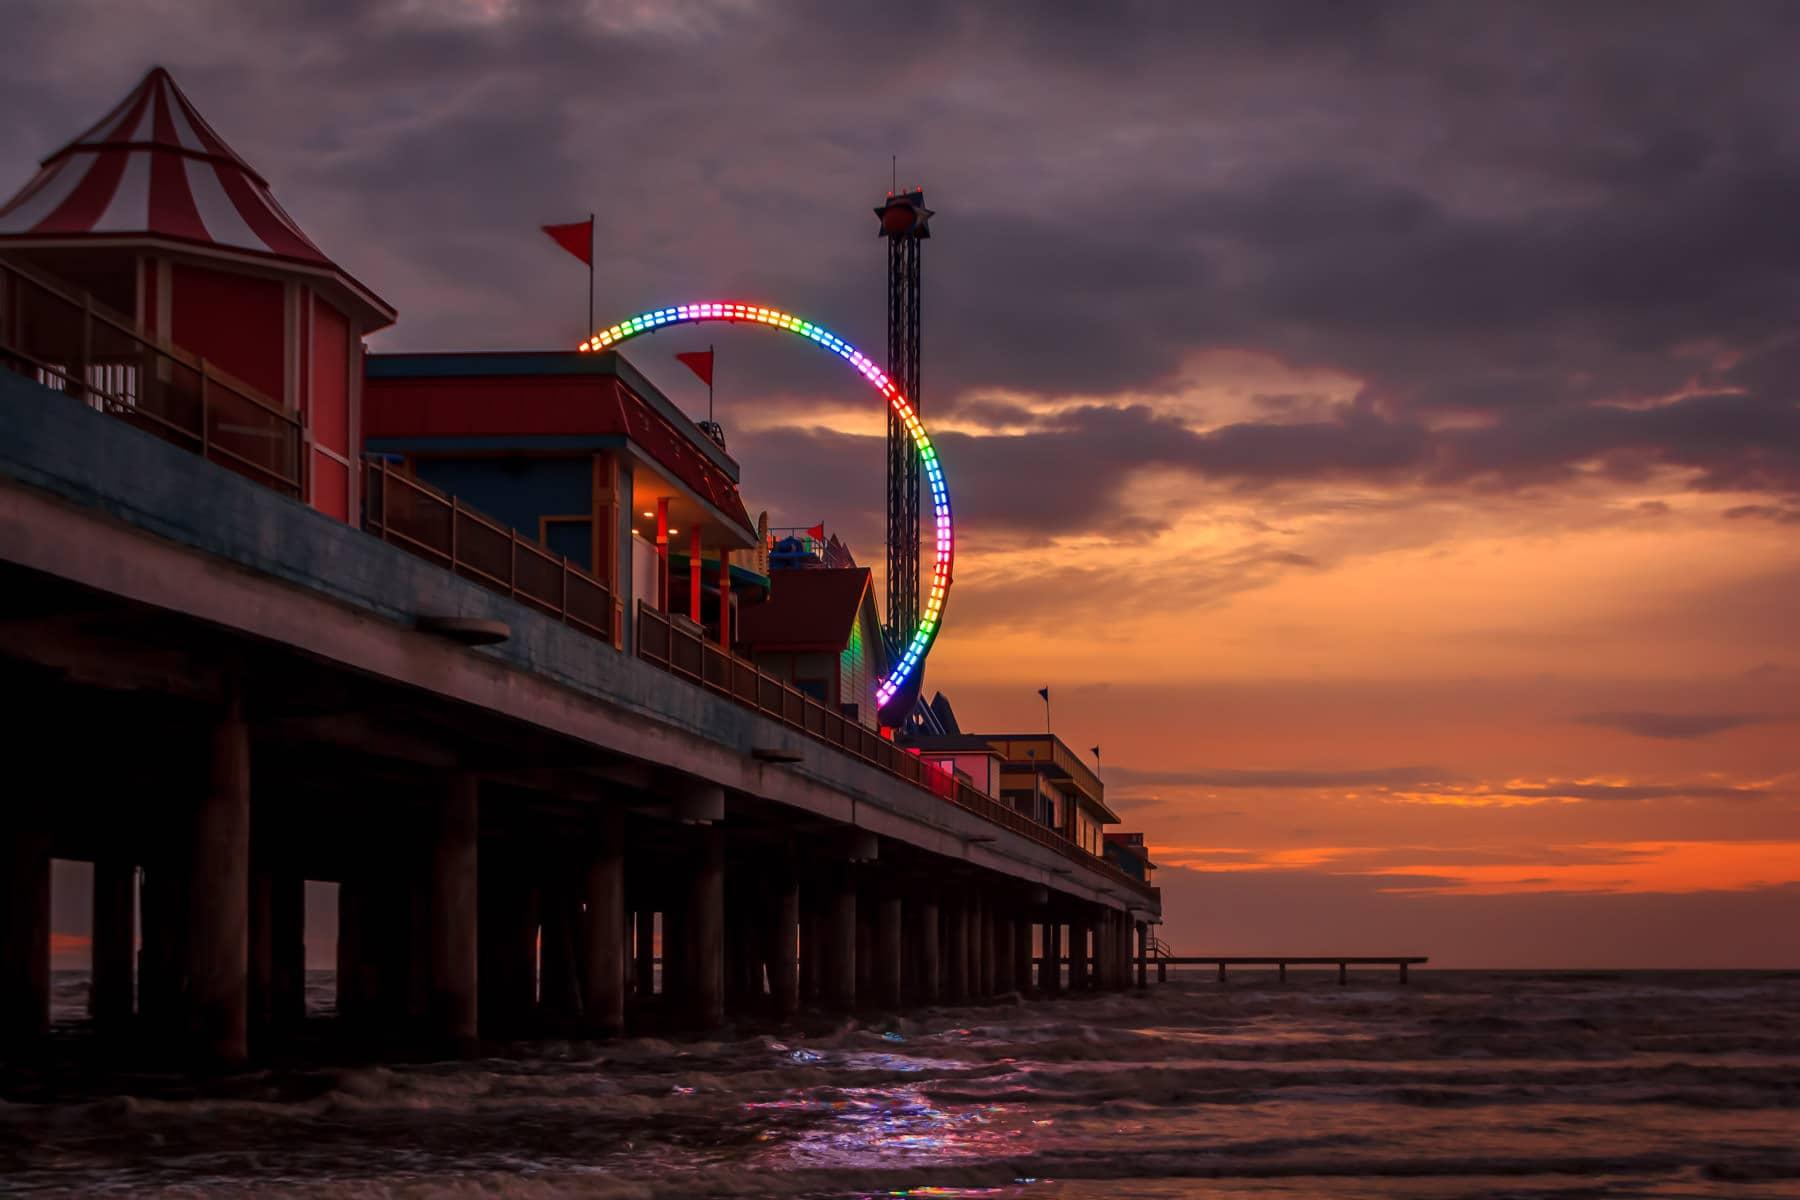 The rainbow-colored lights of a thrill ride on Galveston, Texas' Pleasure Pier pierce the dawn's twilight.